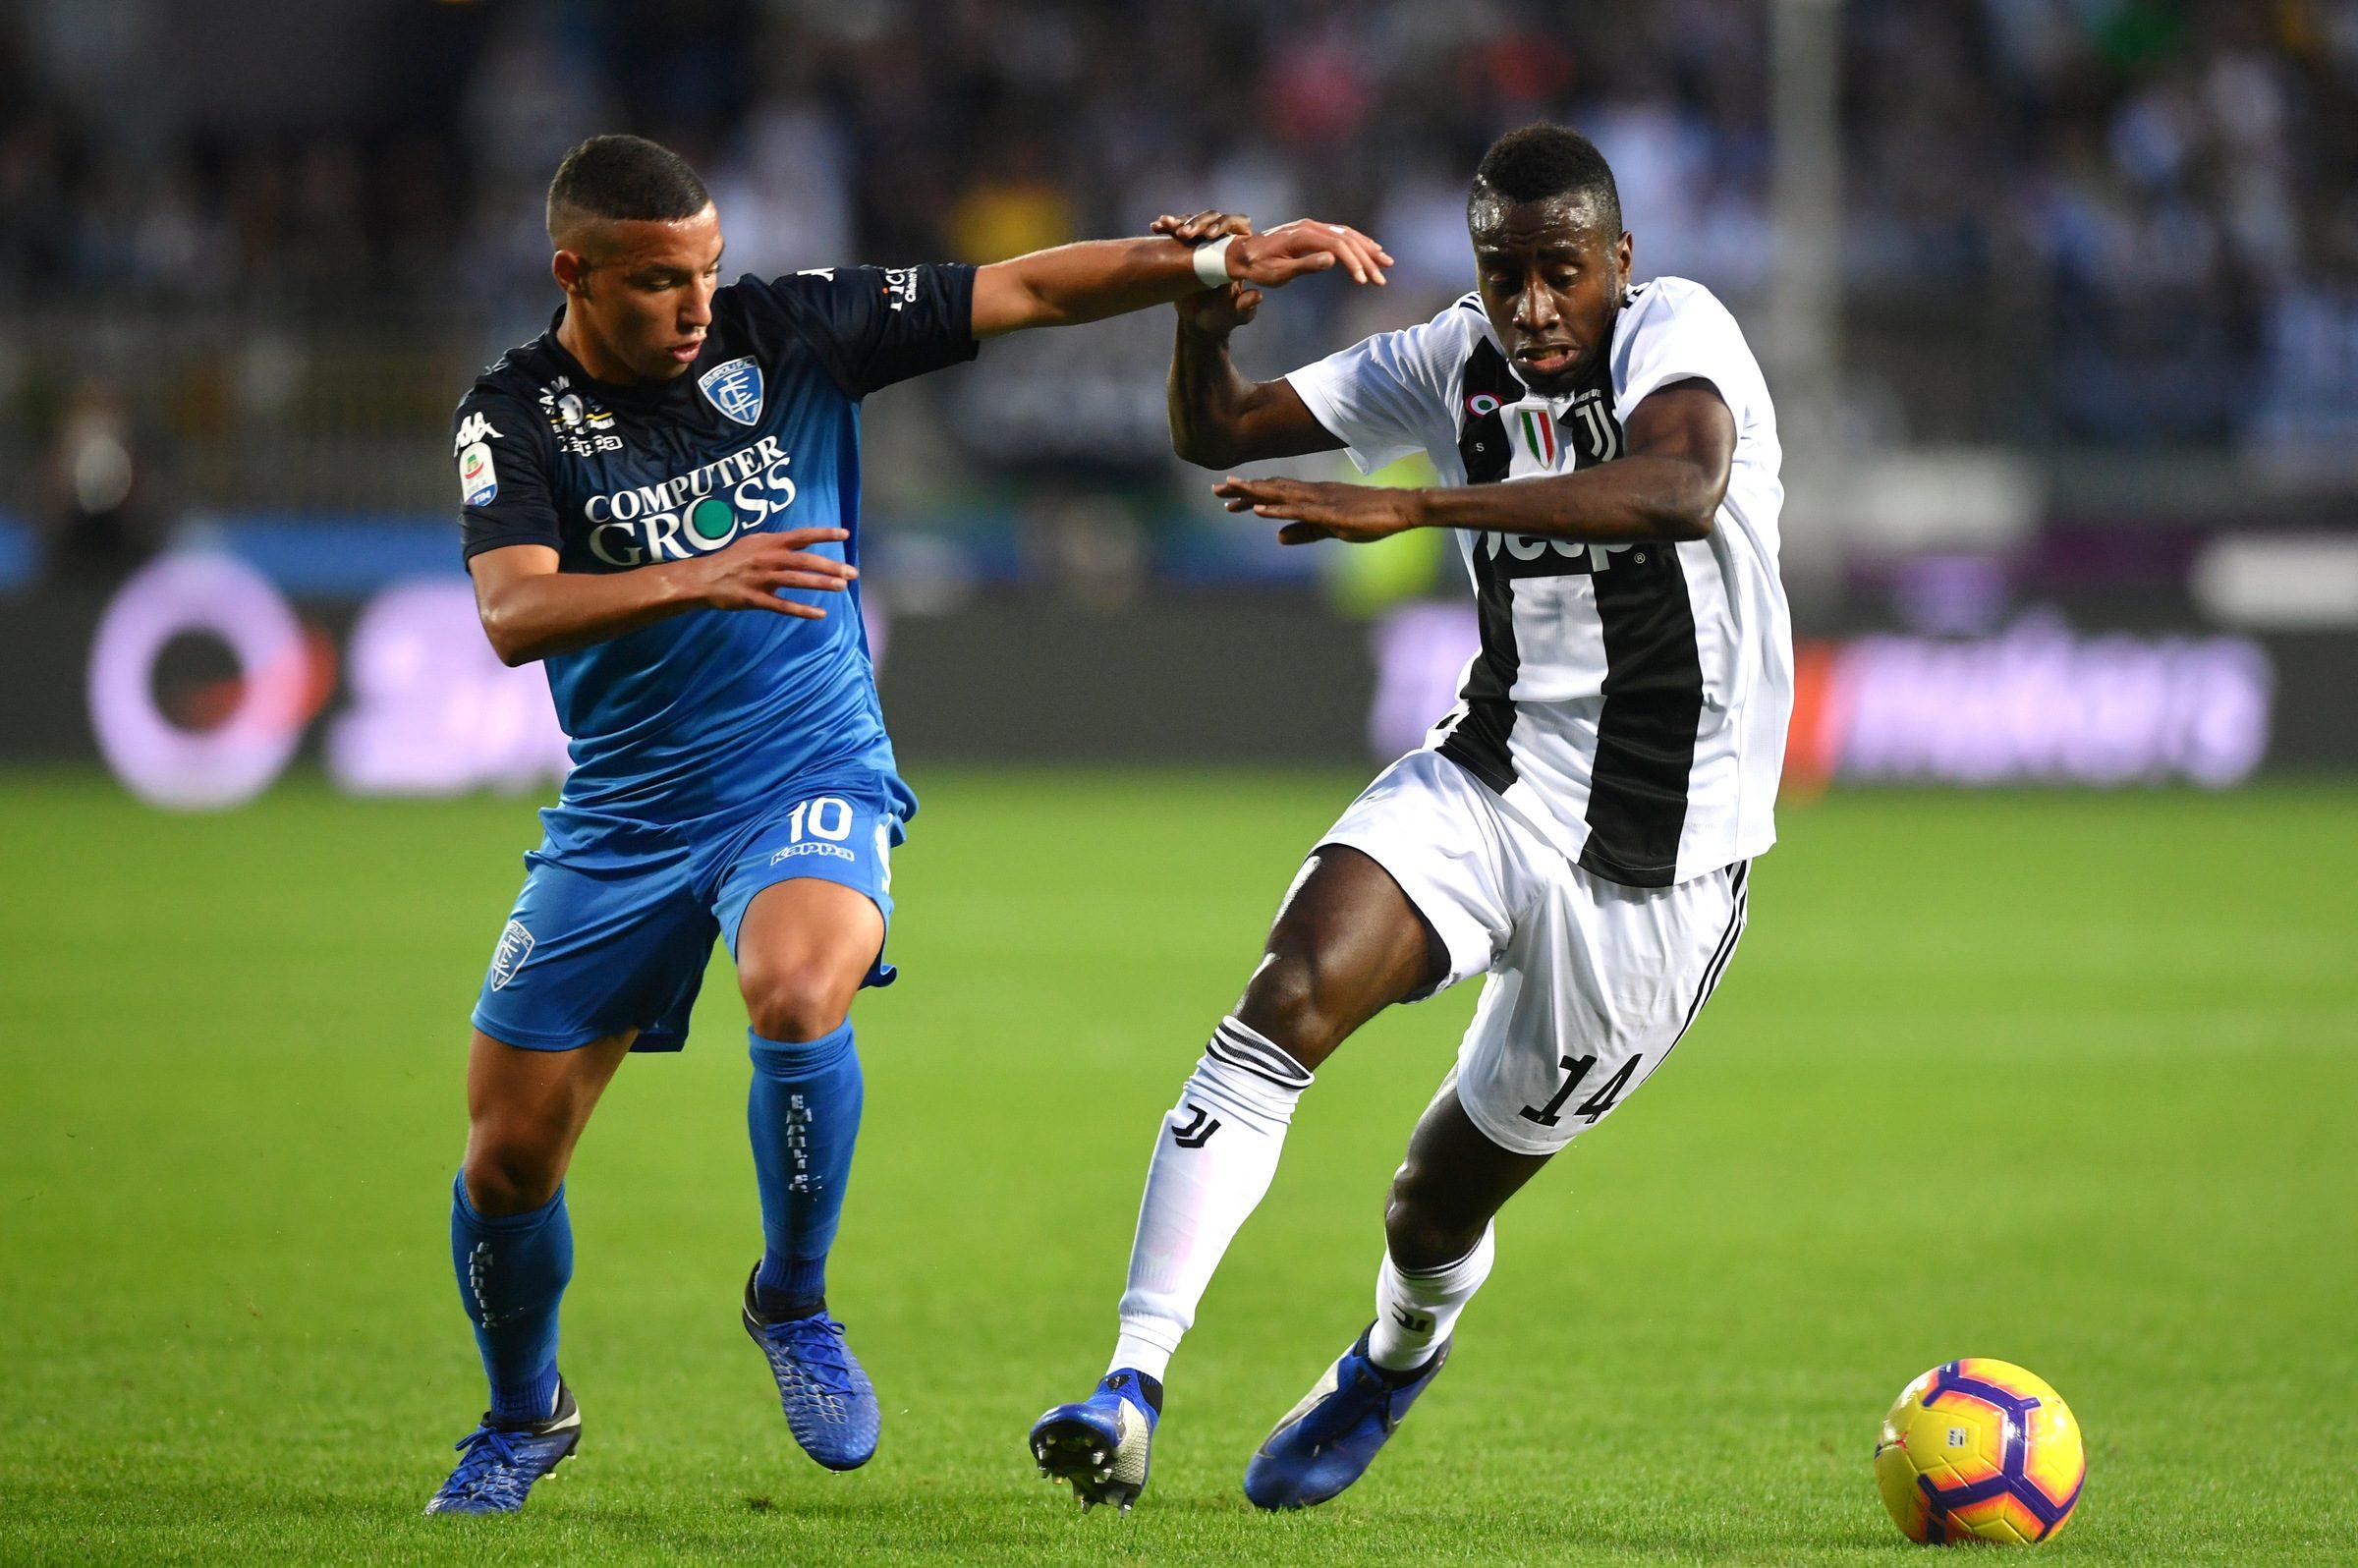 Calciomercato Empoli, le ultime notizie su Ismael Bennacer